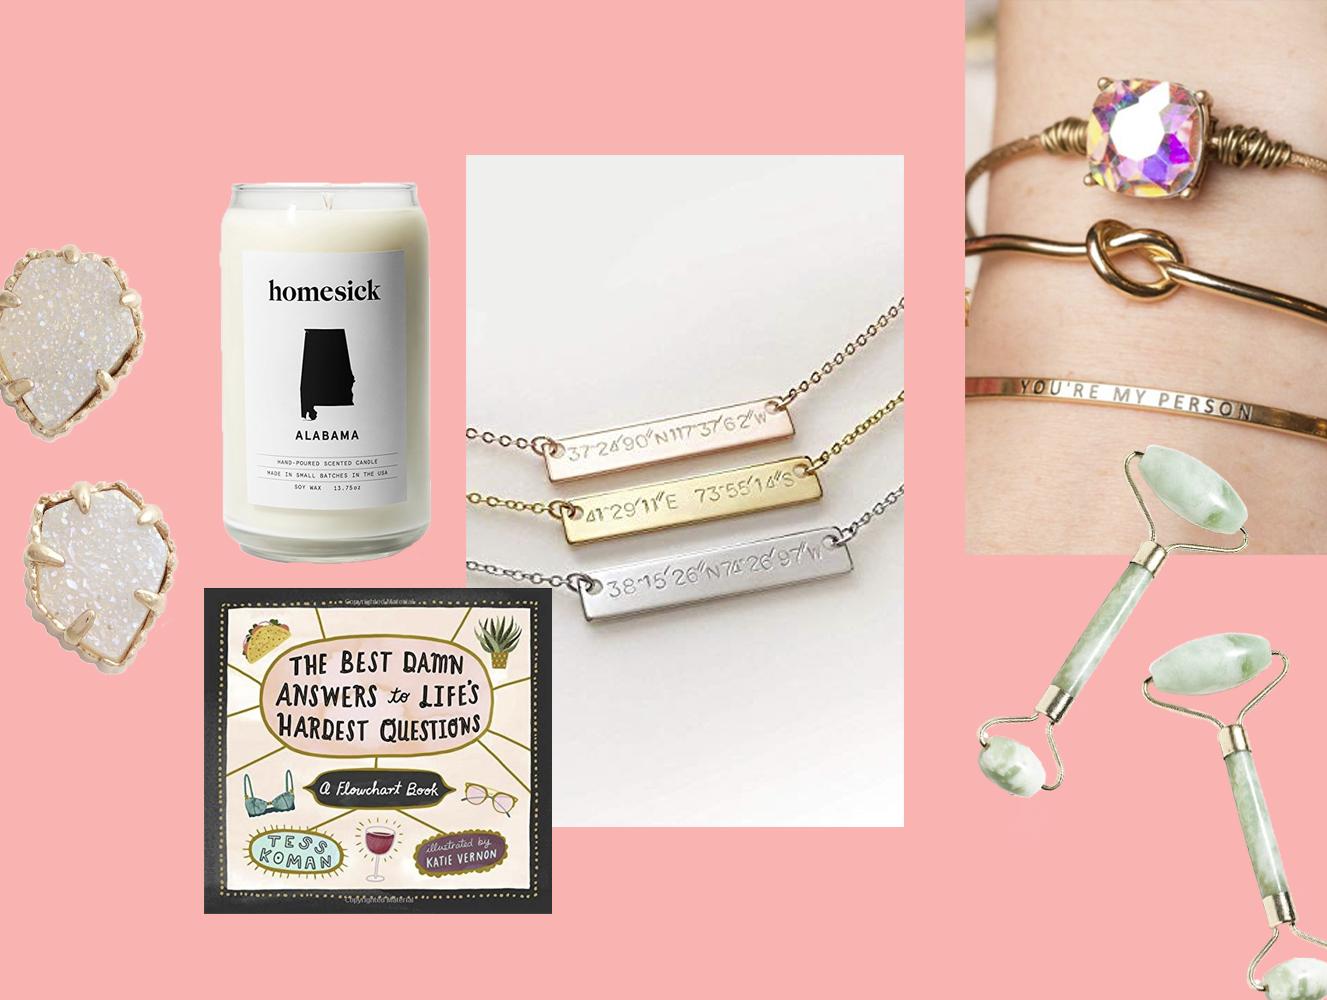 12 days of christmas gift ideas for husband pinterest